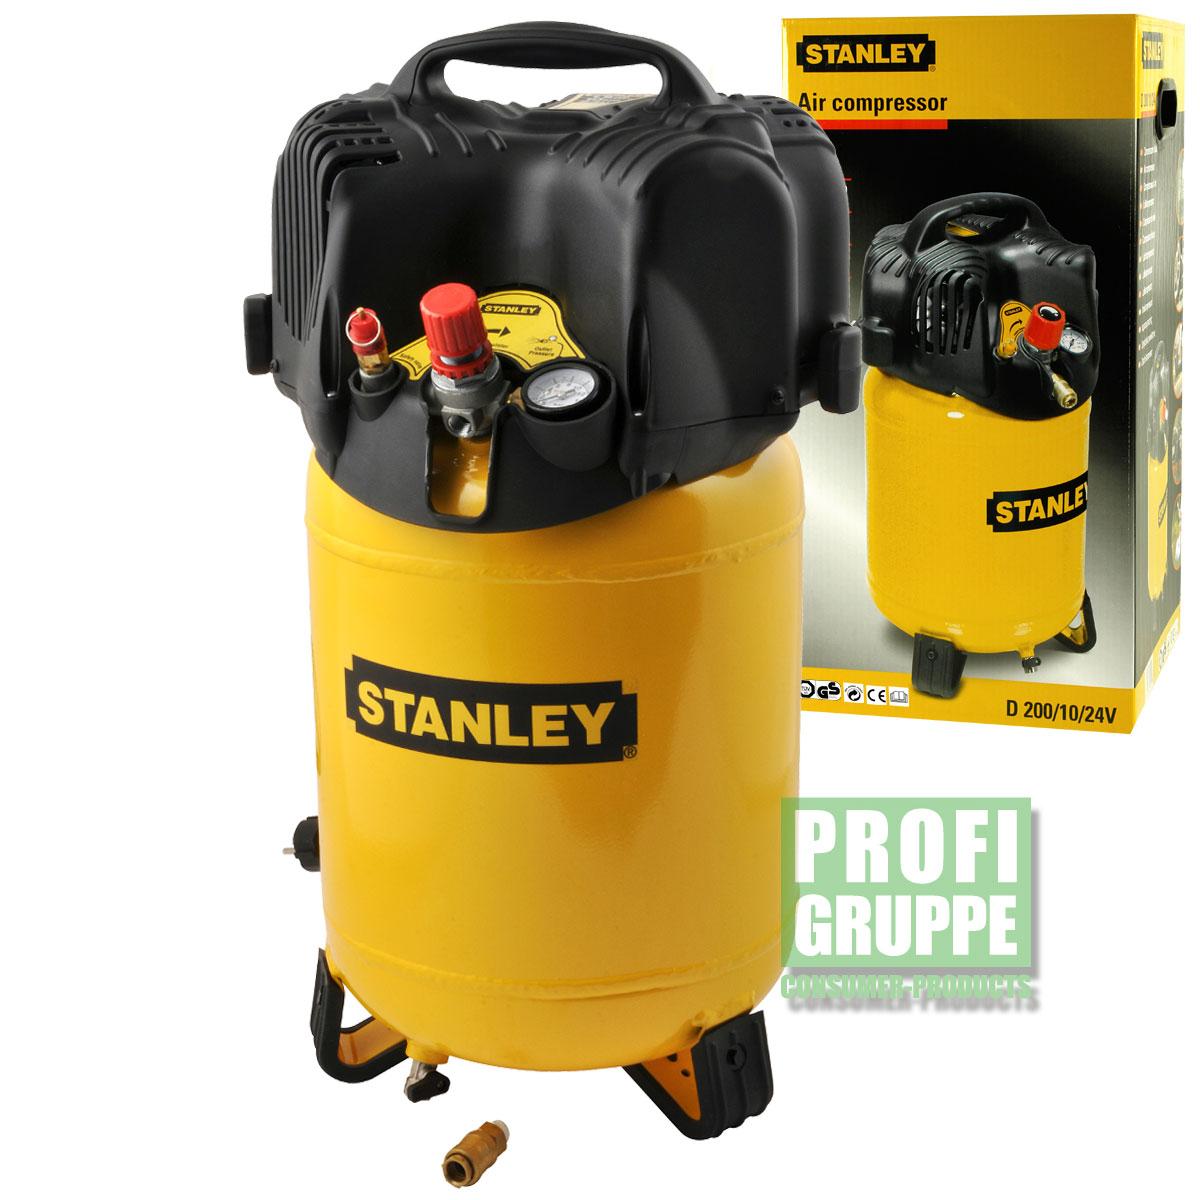 Stanley-Druckluft-Kompressor-1100W-10-bar-24-Liter-1-5-PS-Luftkompressor